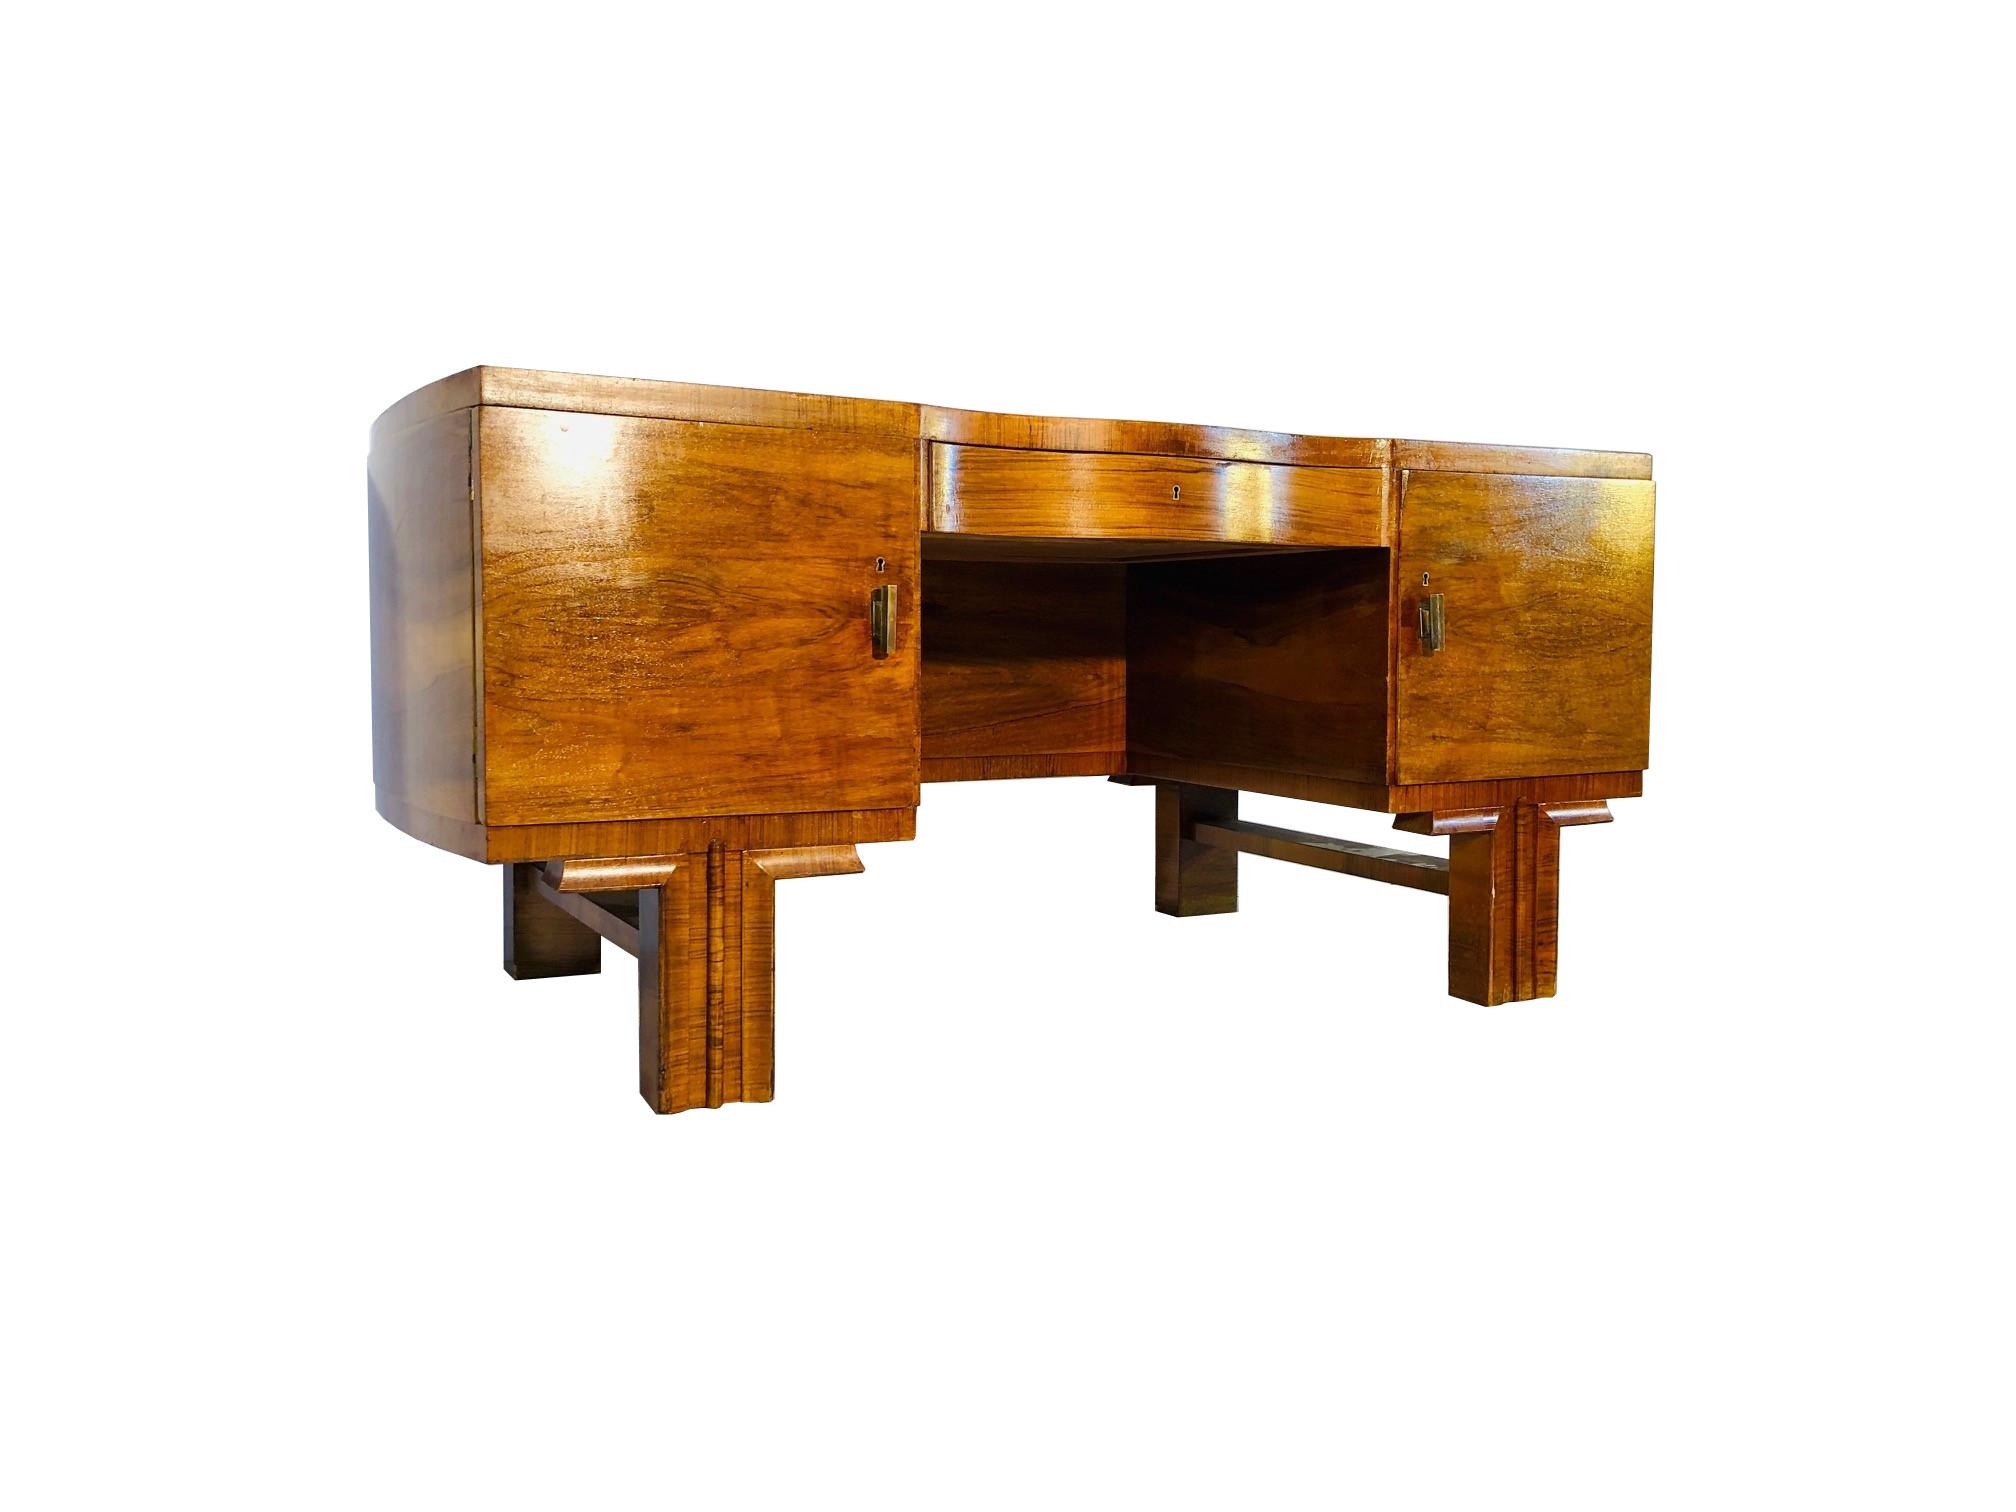 French Art Deco Desk Made Of Walnut Wood Brass Handles Original